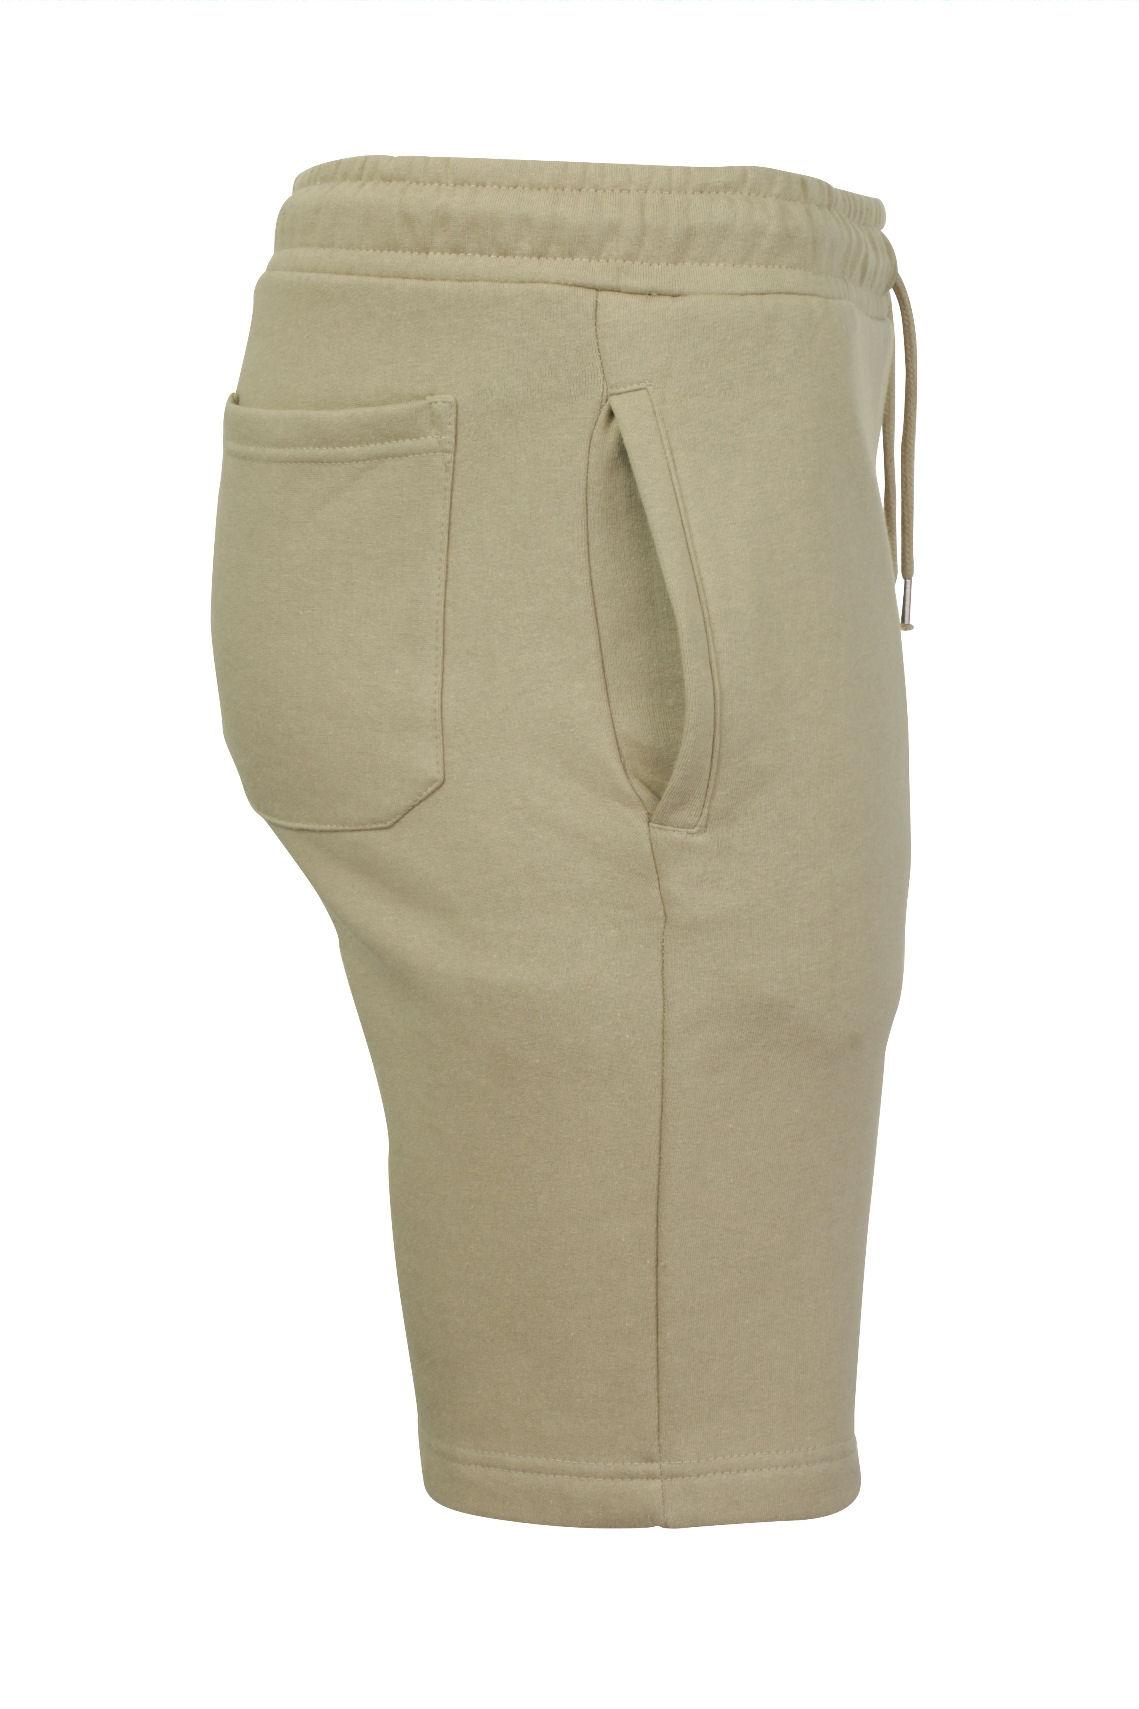 Mens-Jogger-Shorts-Tarley-by-Brave-Soul-Knee-Length-Casual-Fleece-Lined-Summer thumbnail 38